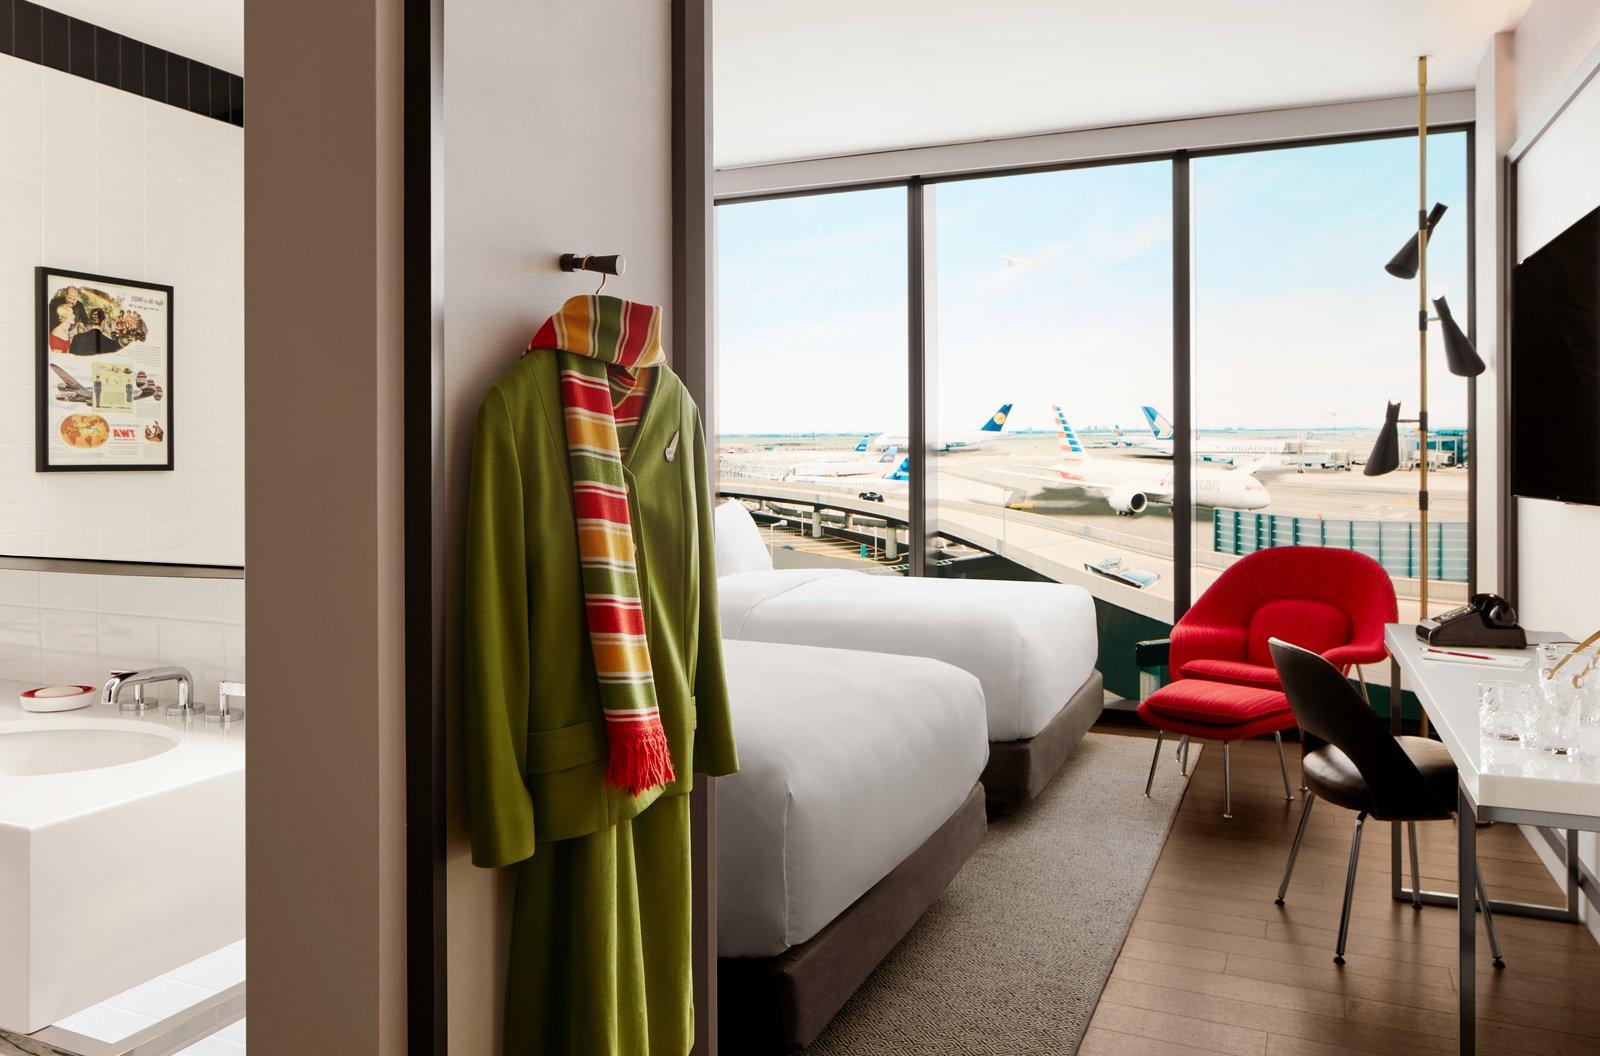 TWA Hotel JFK Airport guest room